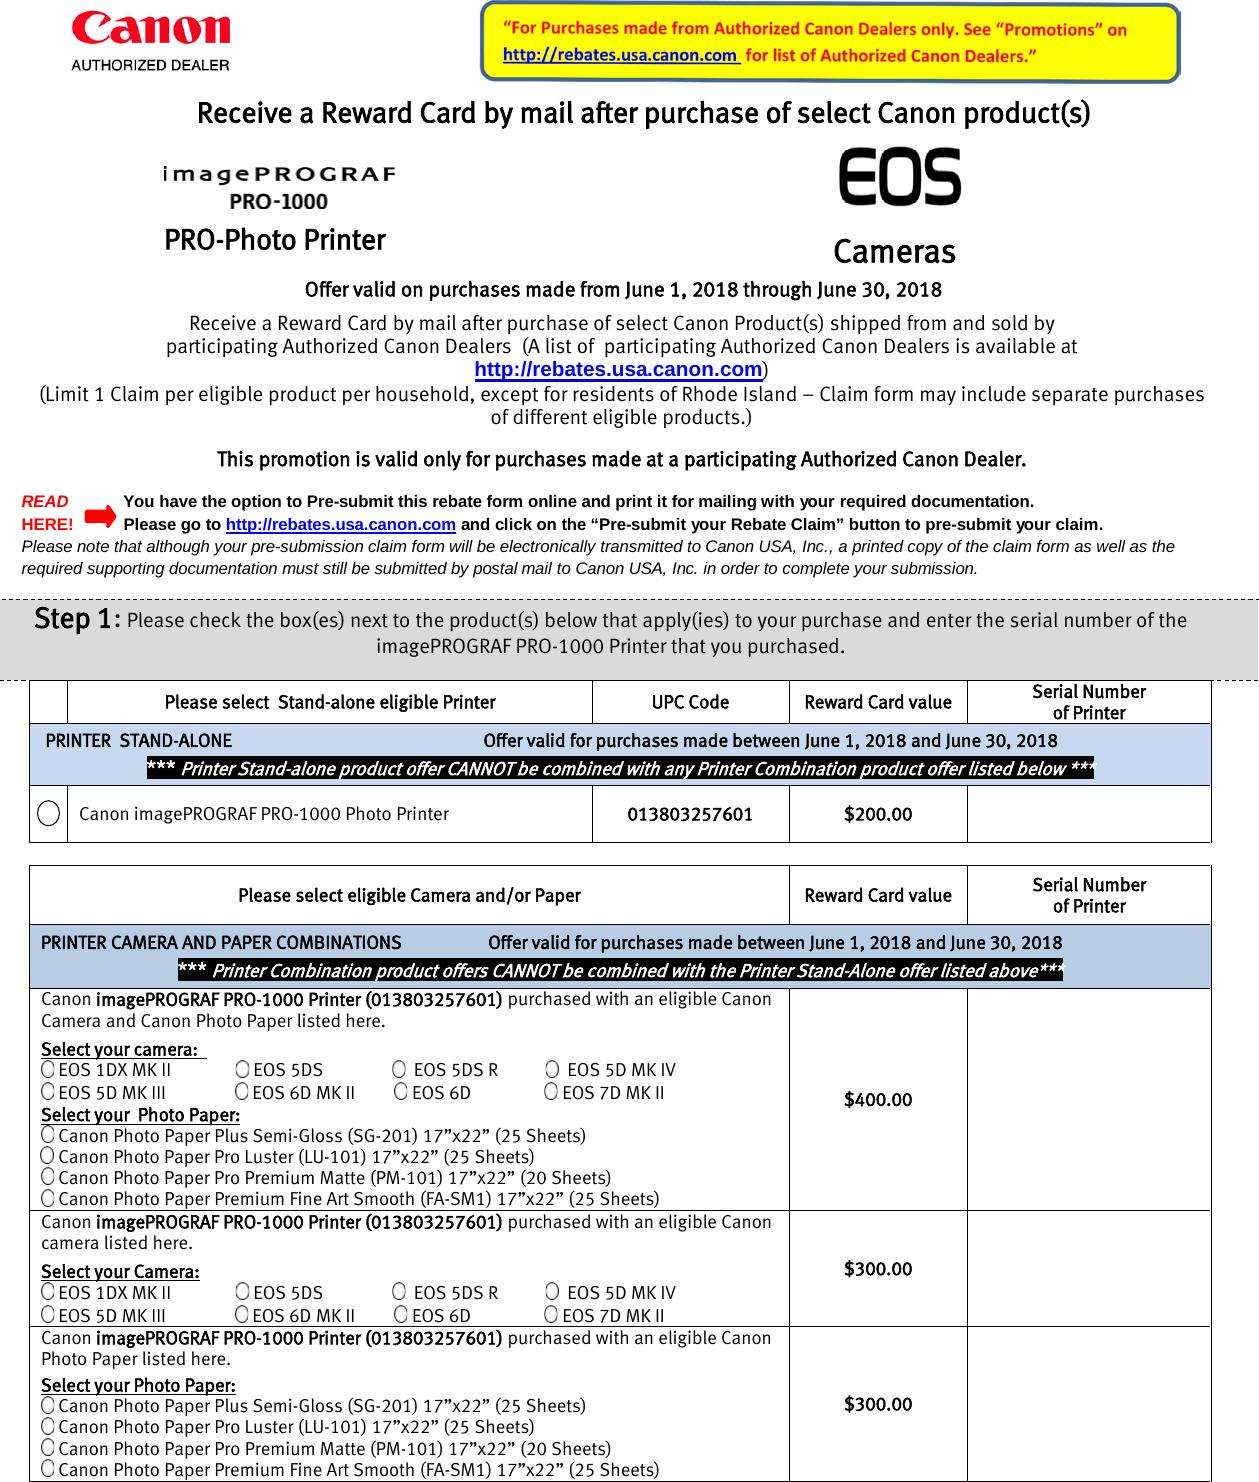 Canon Image PROGRAF & EOS Cameras Mail in Rebate Pro 1000